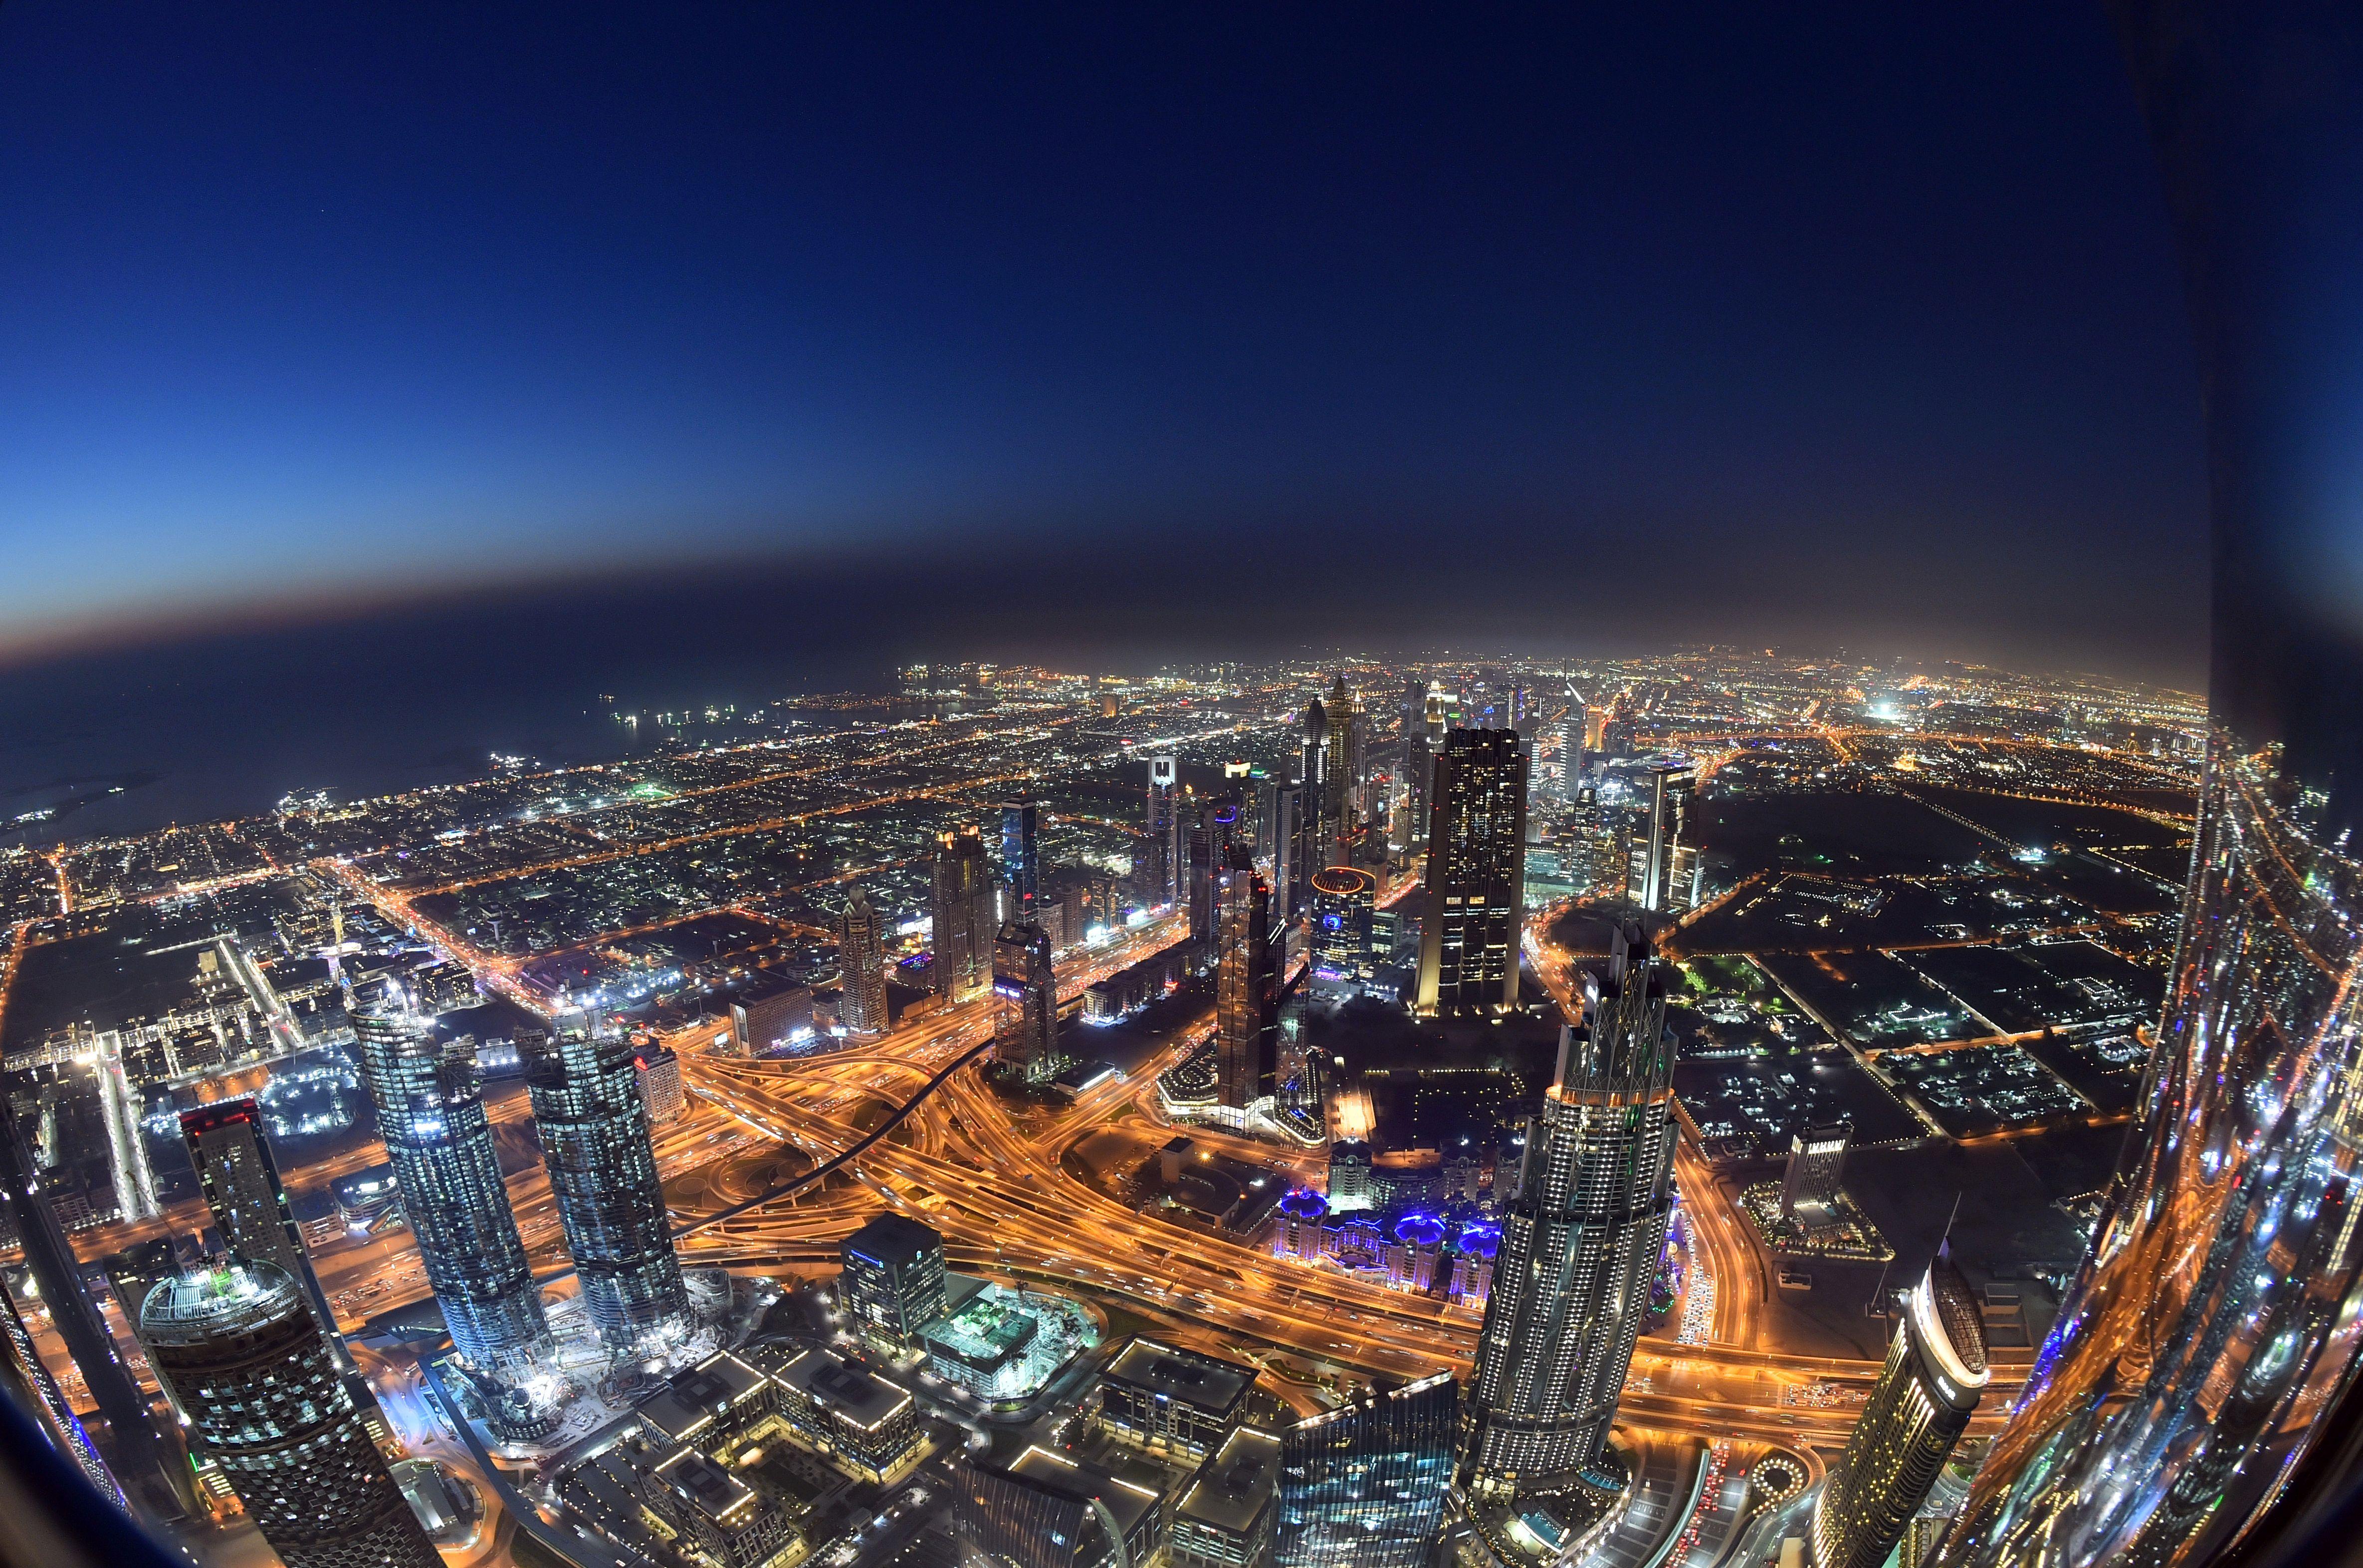 Dubais Burj Khalifa A Look Inside The Worlds Tallest Building